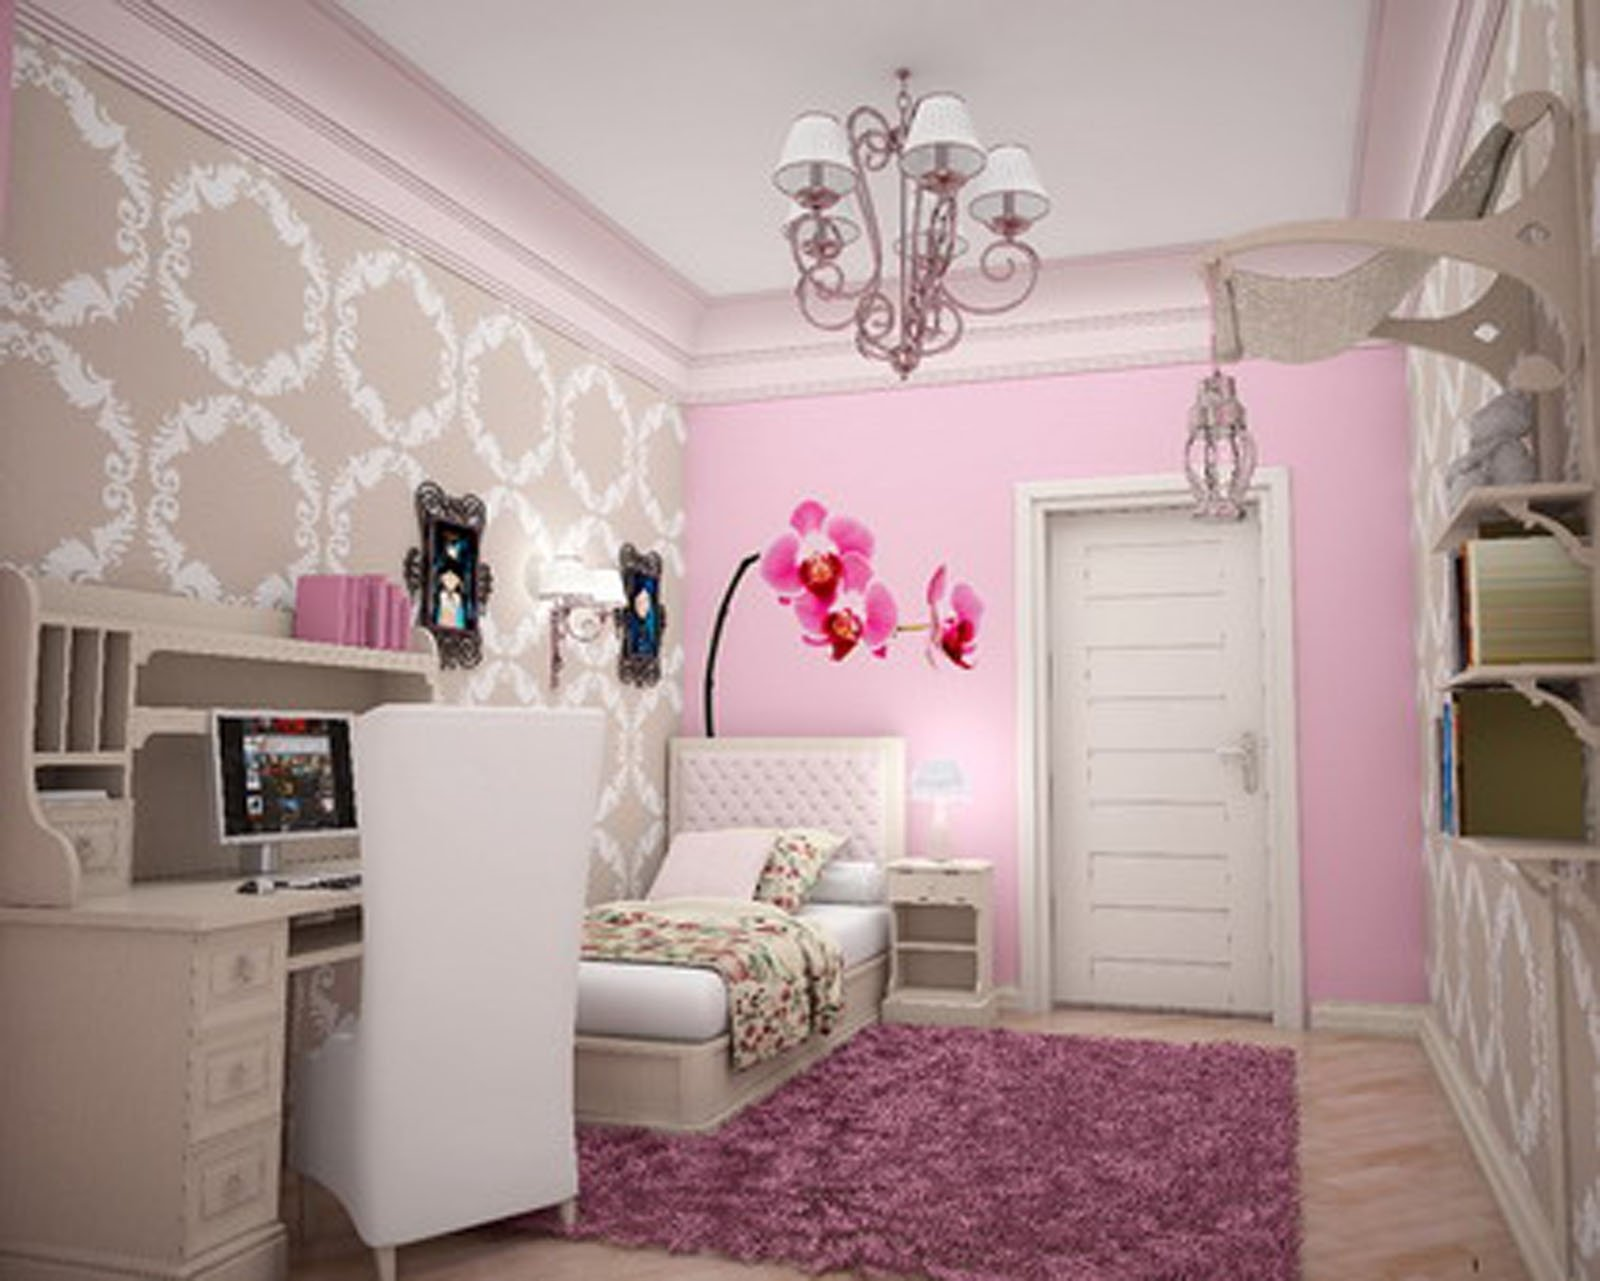 10 Stylish Small Bedroom Ideas For Girls teenage girl bedroom designs for small rooms bedroom simple teenage 3 2020